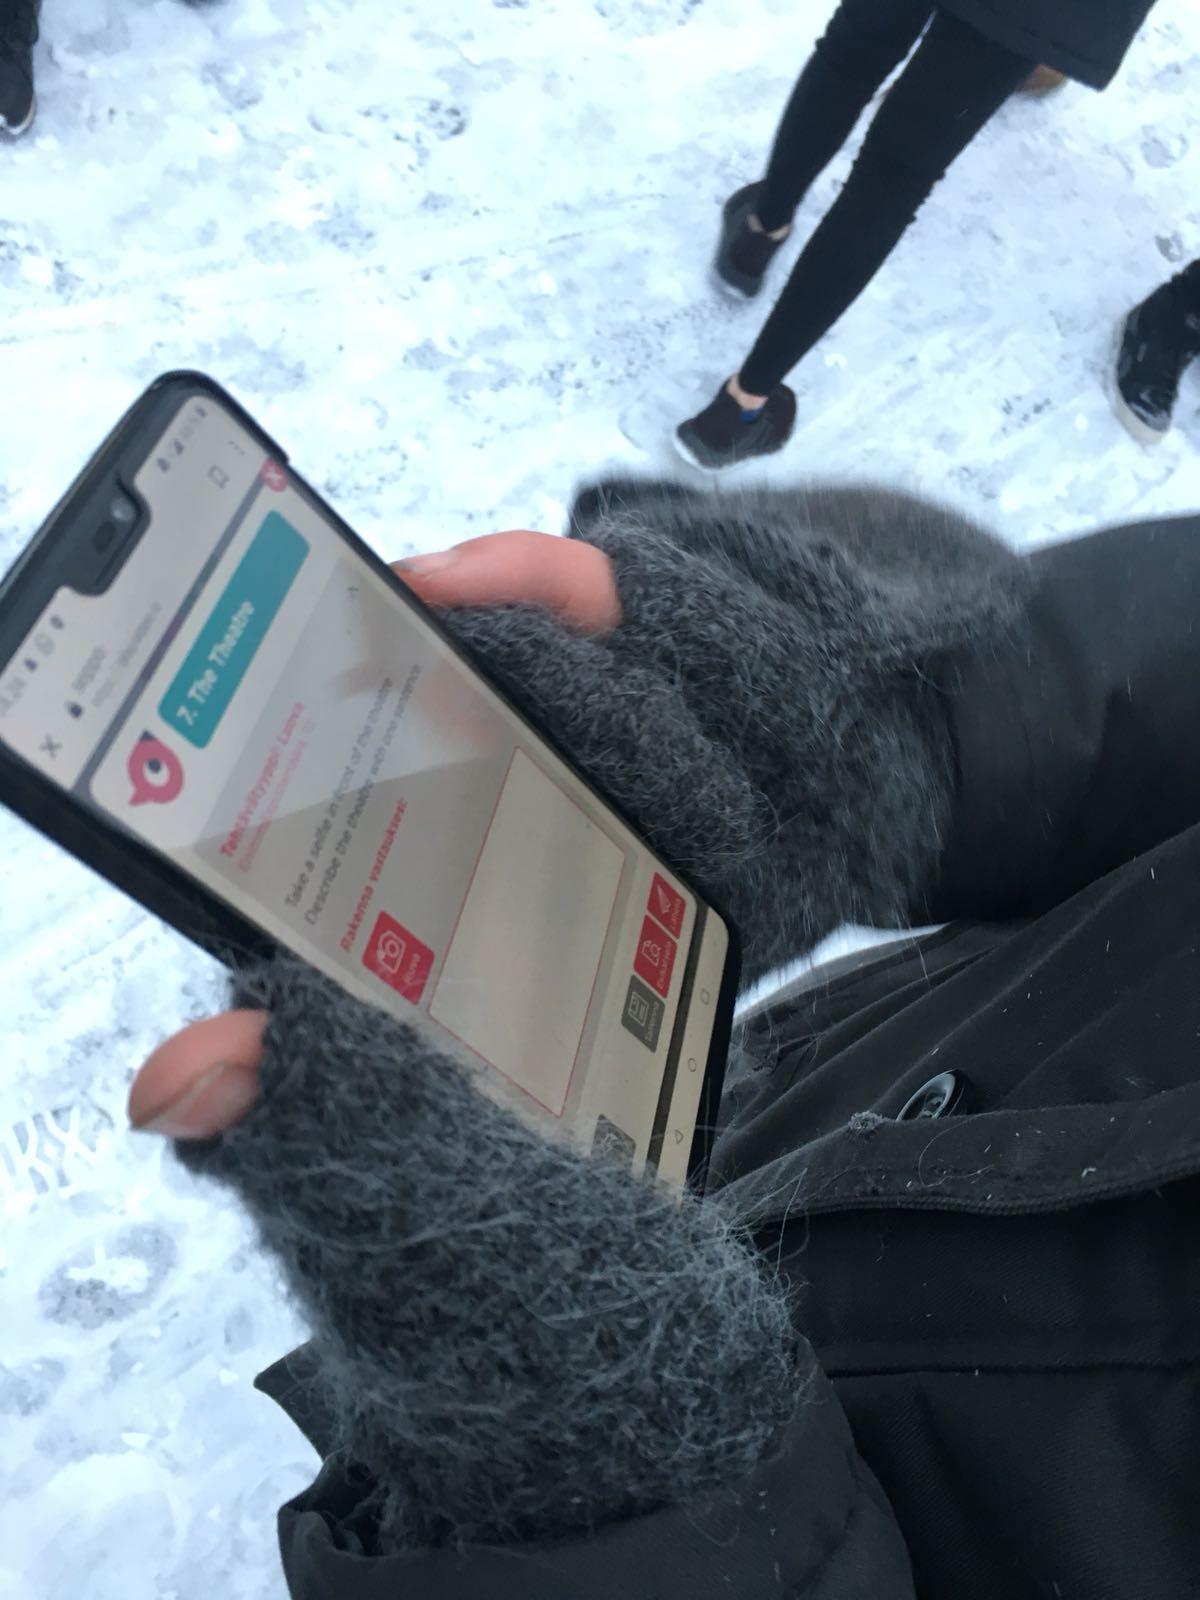 Seppo mobile app